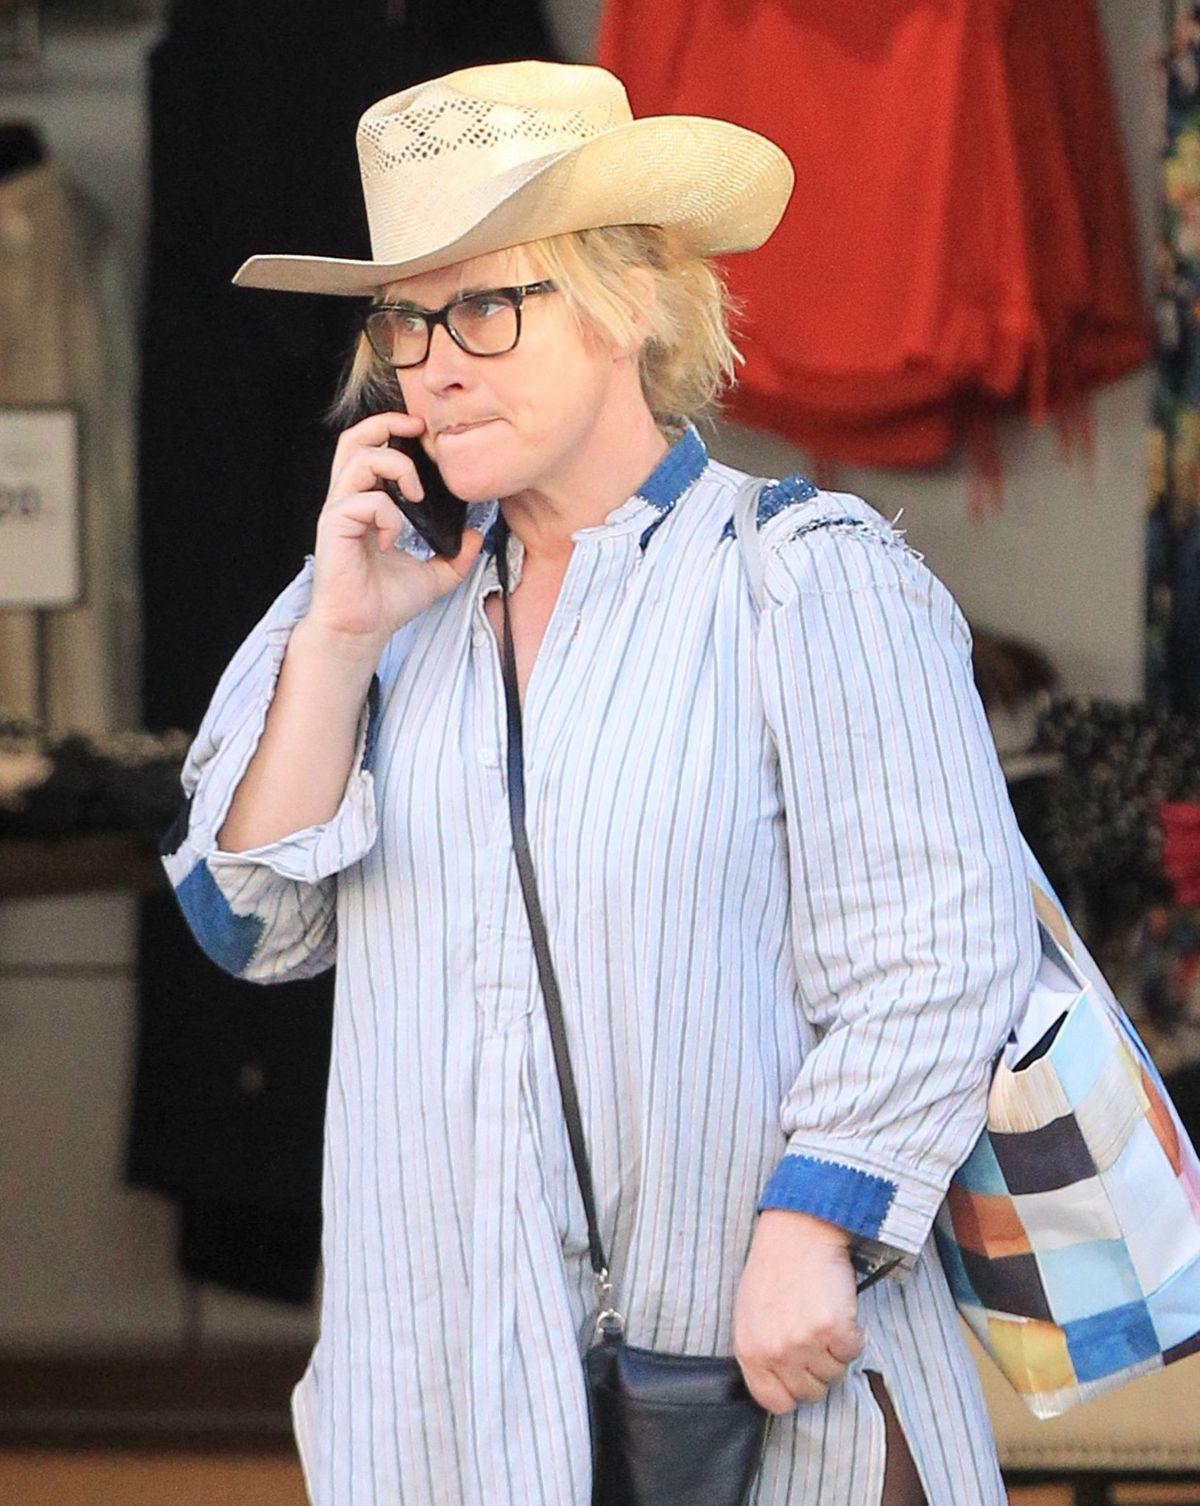 PATRICIA ARQUETTE Shoppiung at The Grove in Los Angeles 03/01/2017